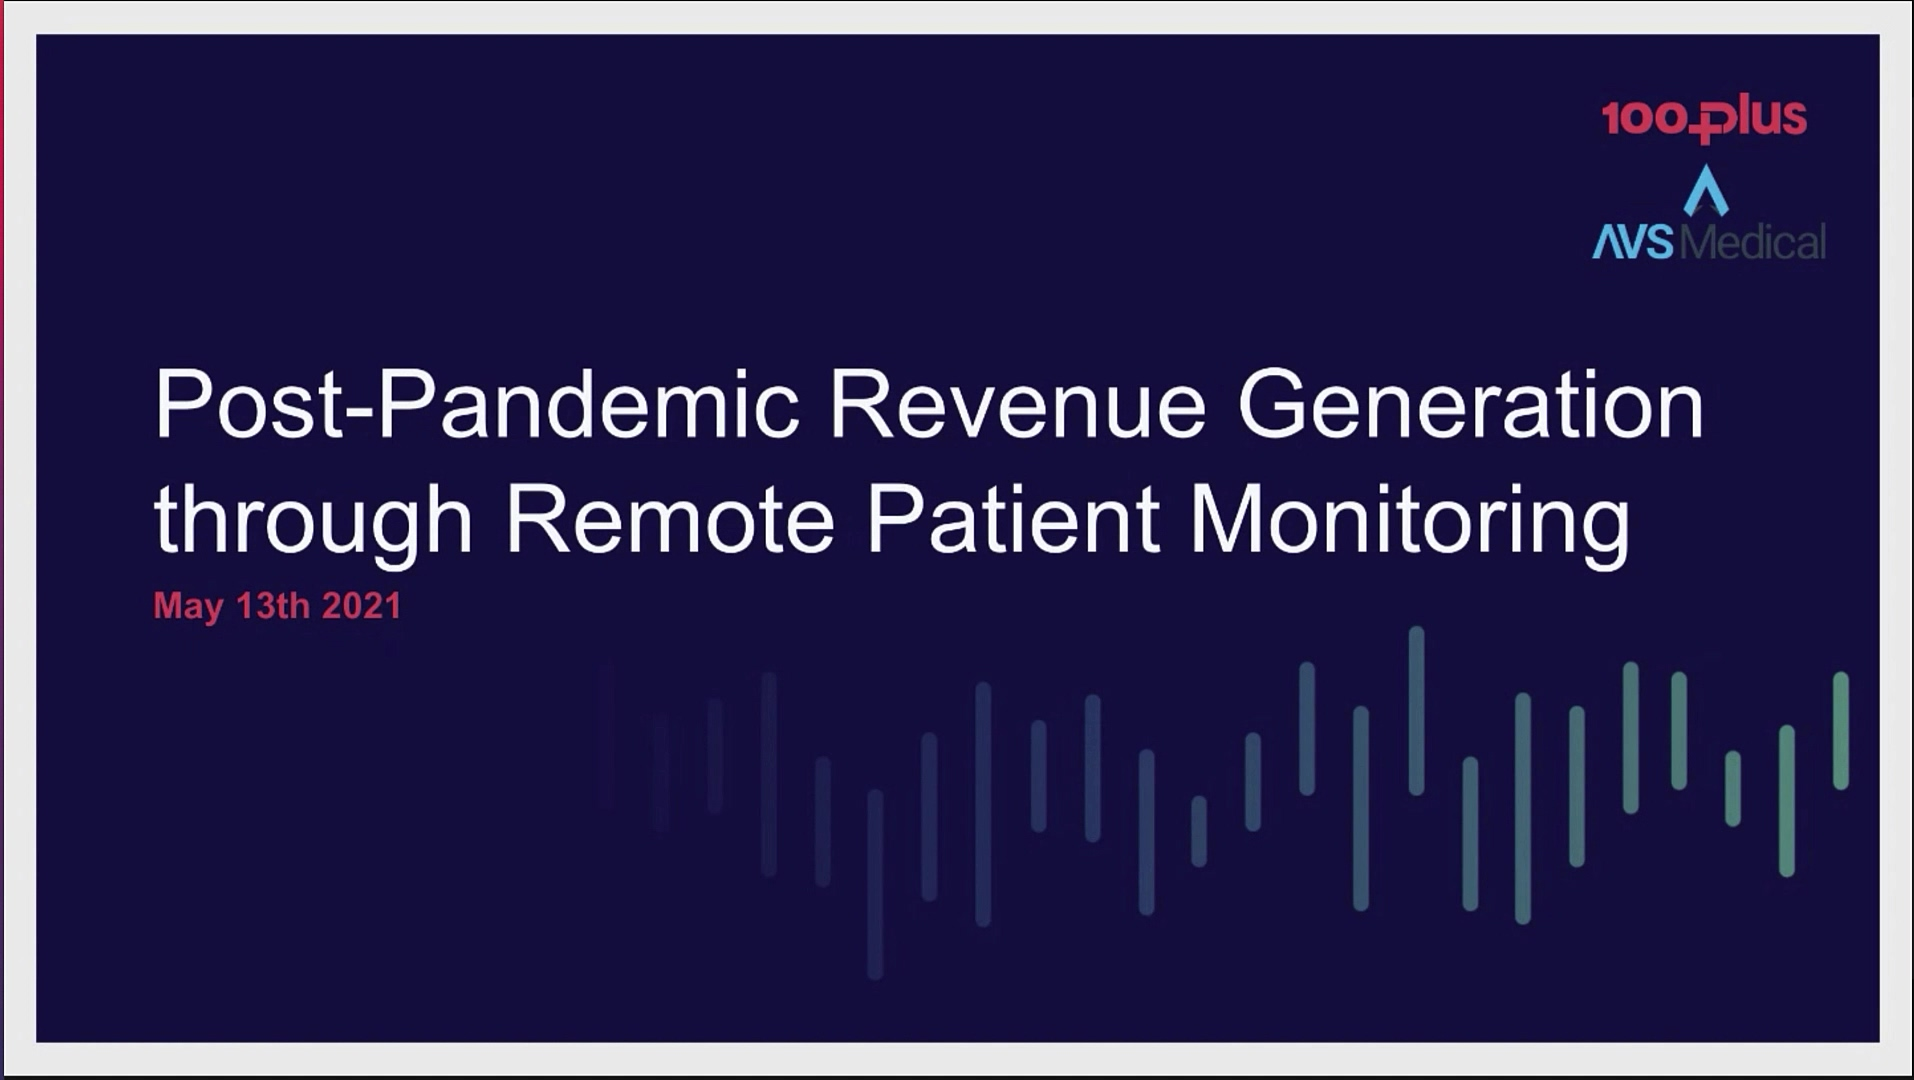 revenue generation through remote patient monitoring